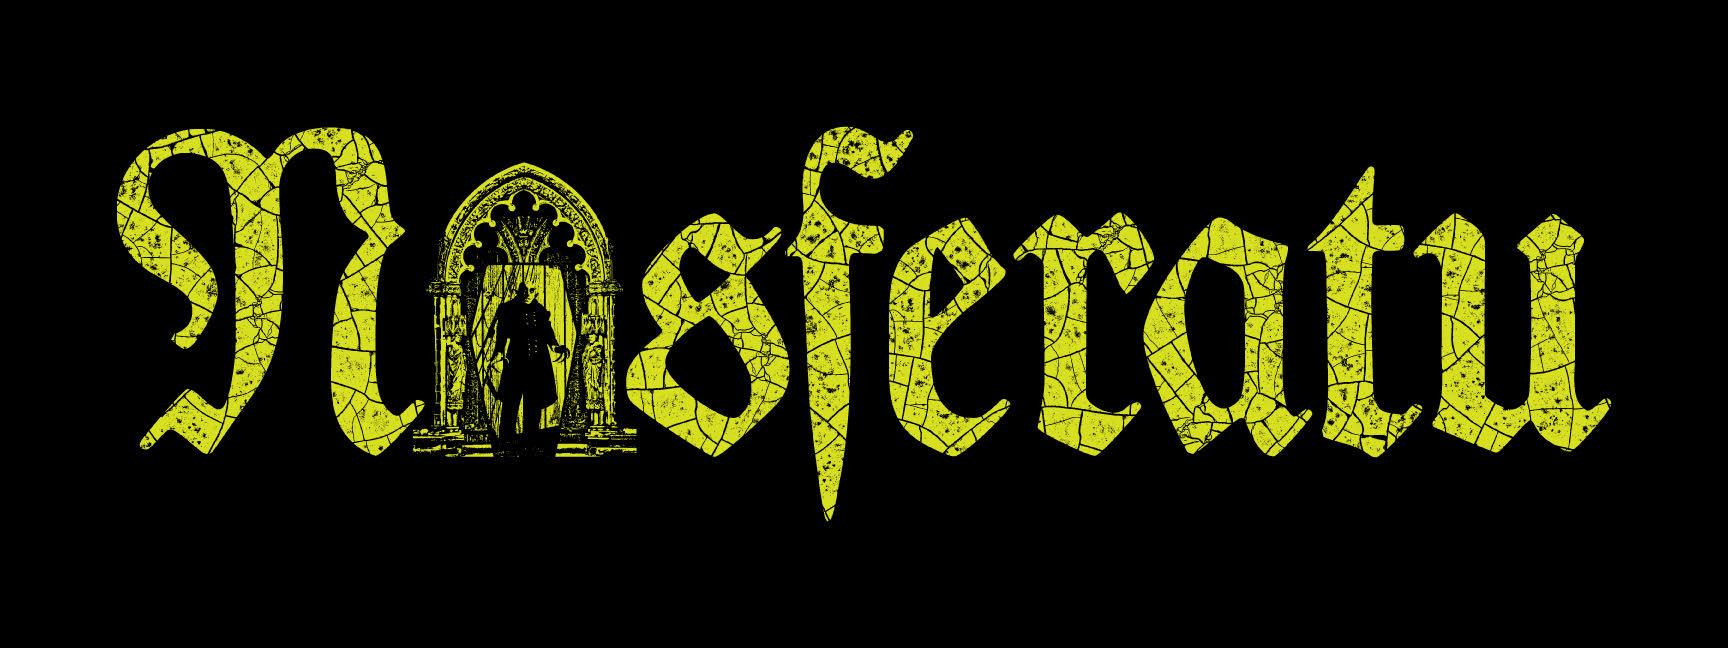 Nosferatu - Crypt Edition Glow